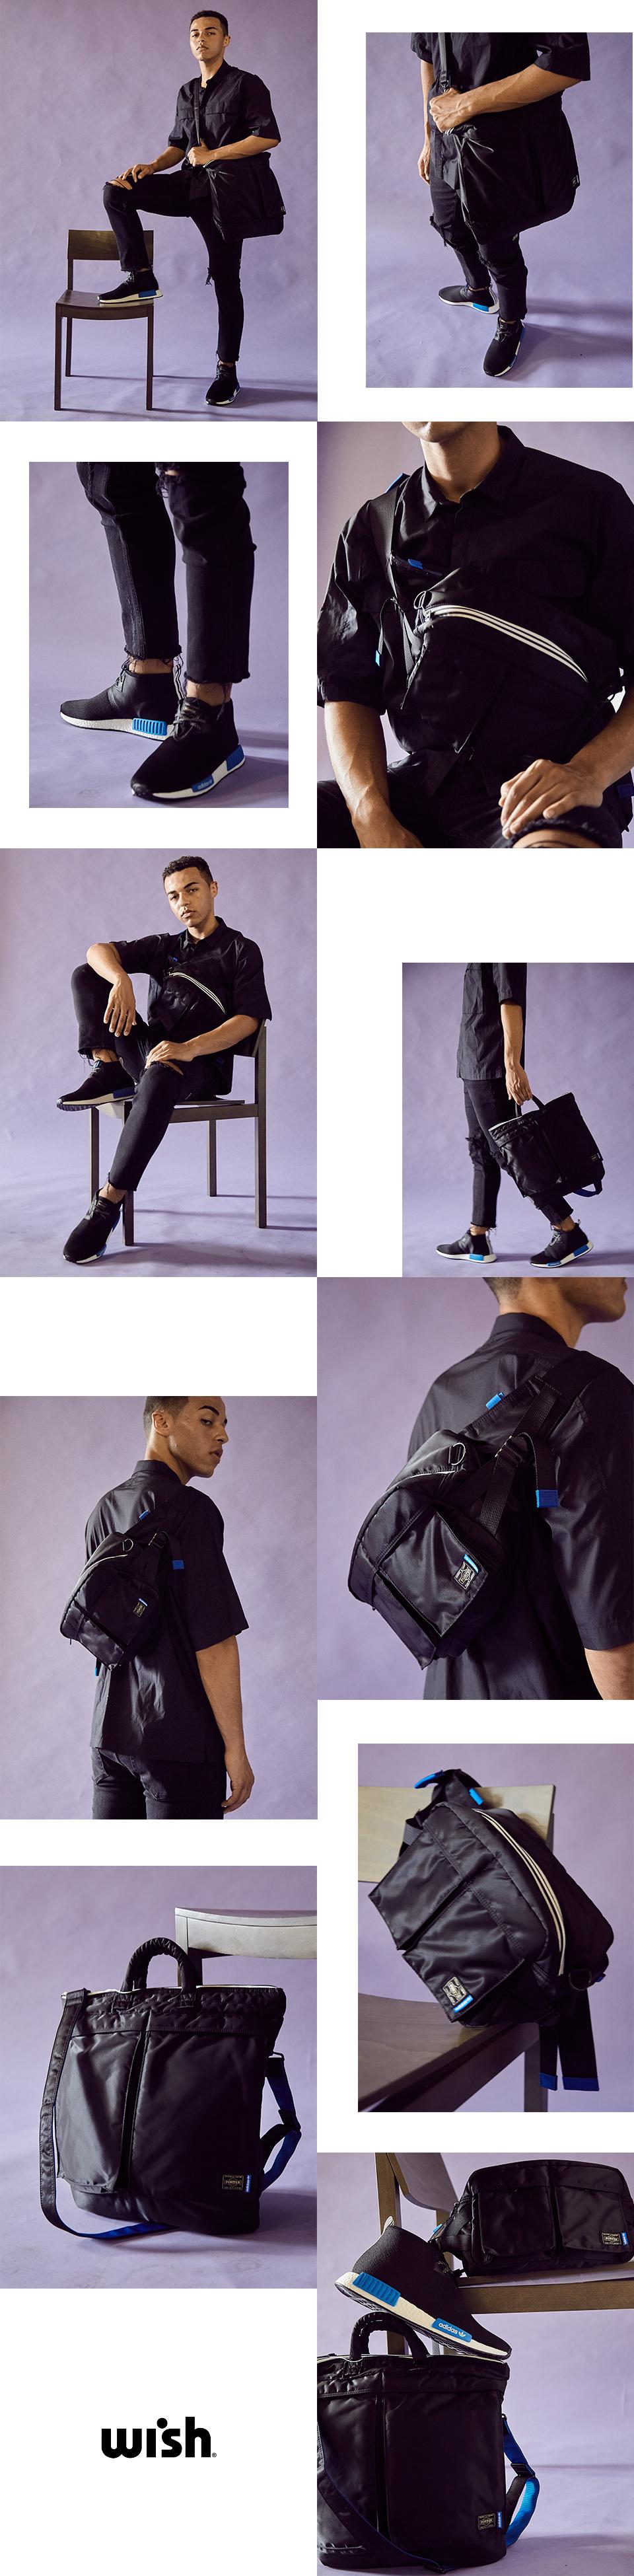 Adidas x Porter